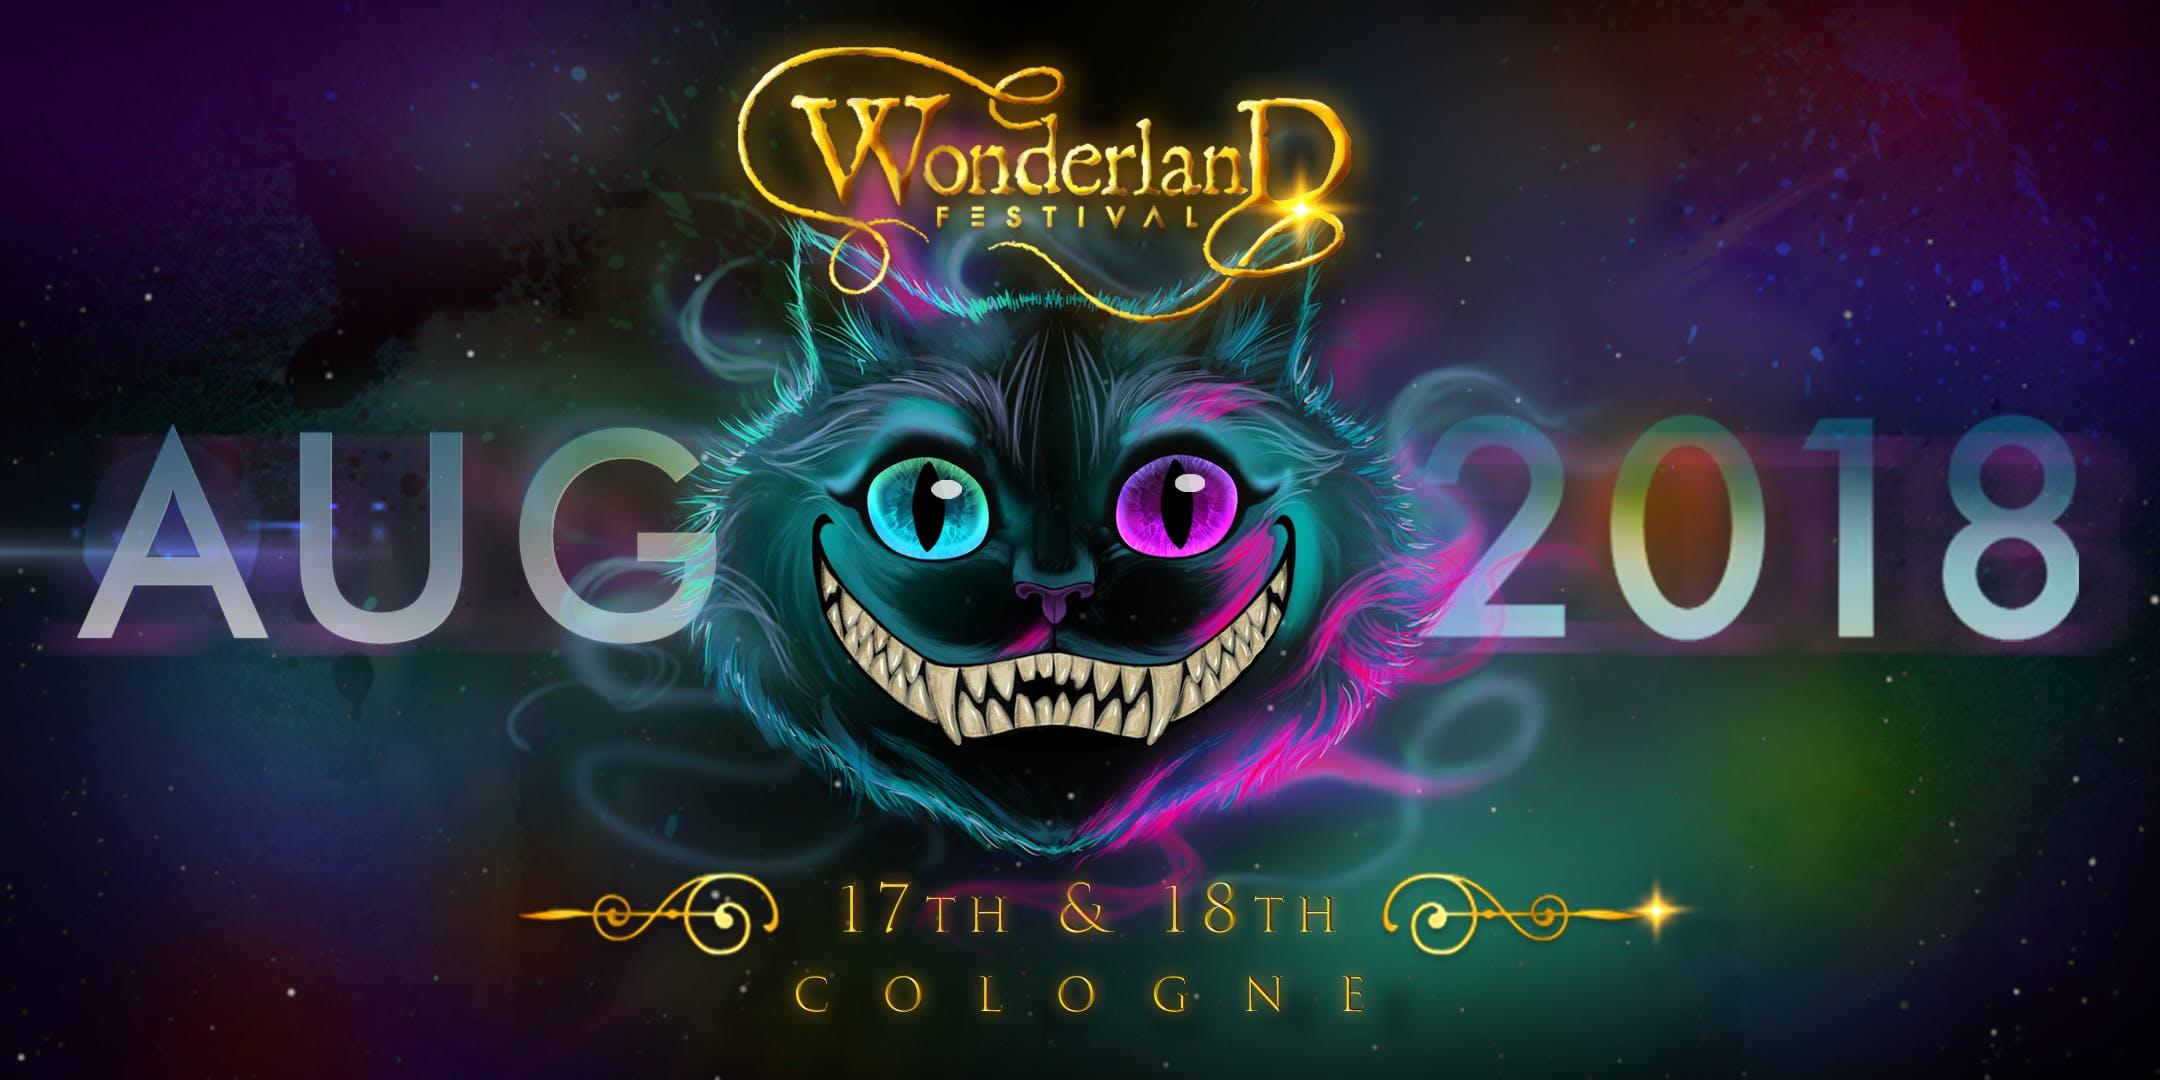 Wonderland Festival 2018 I Cologne